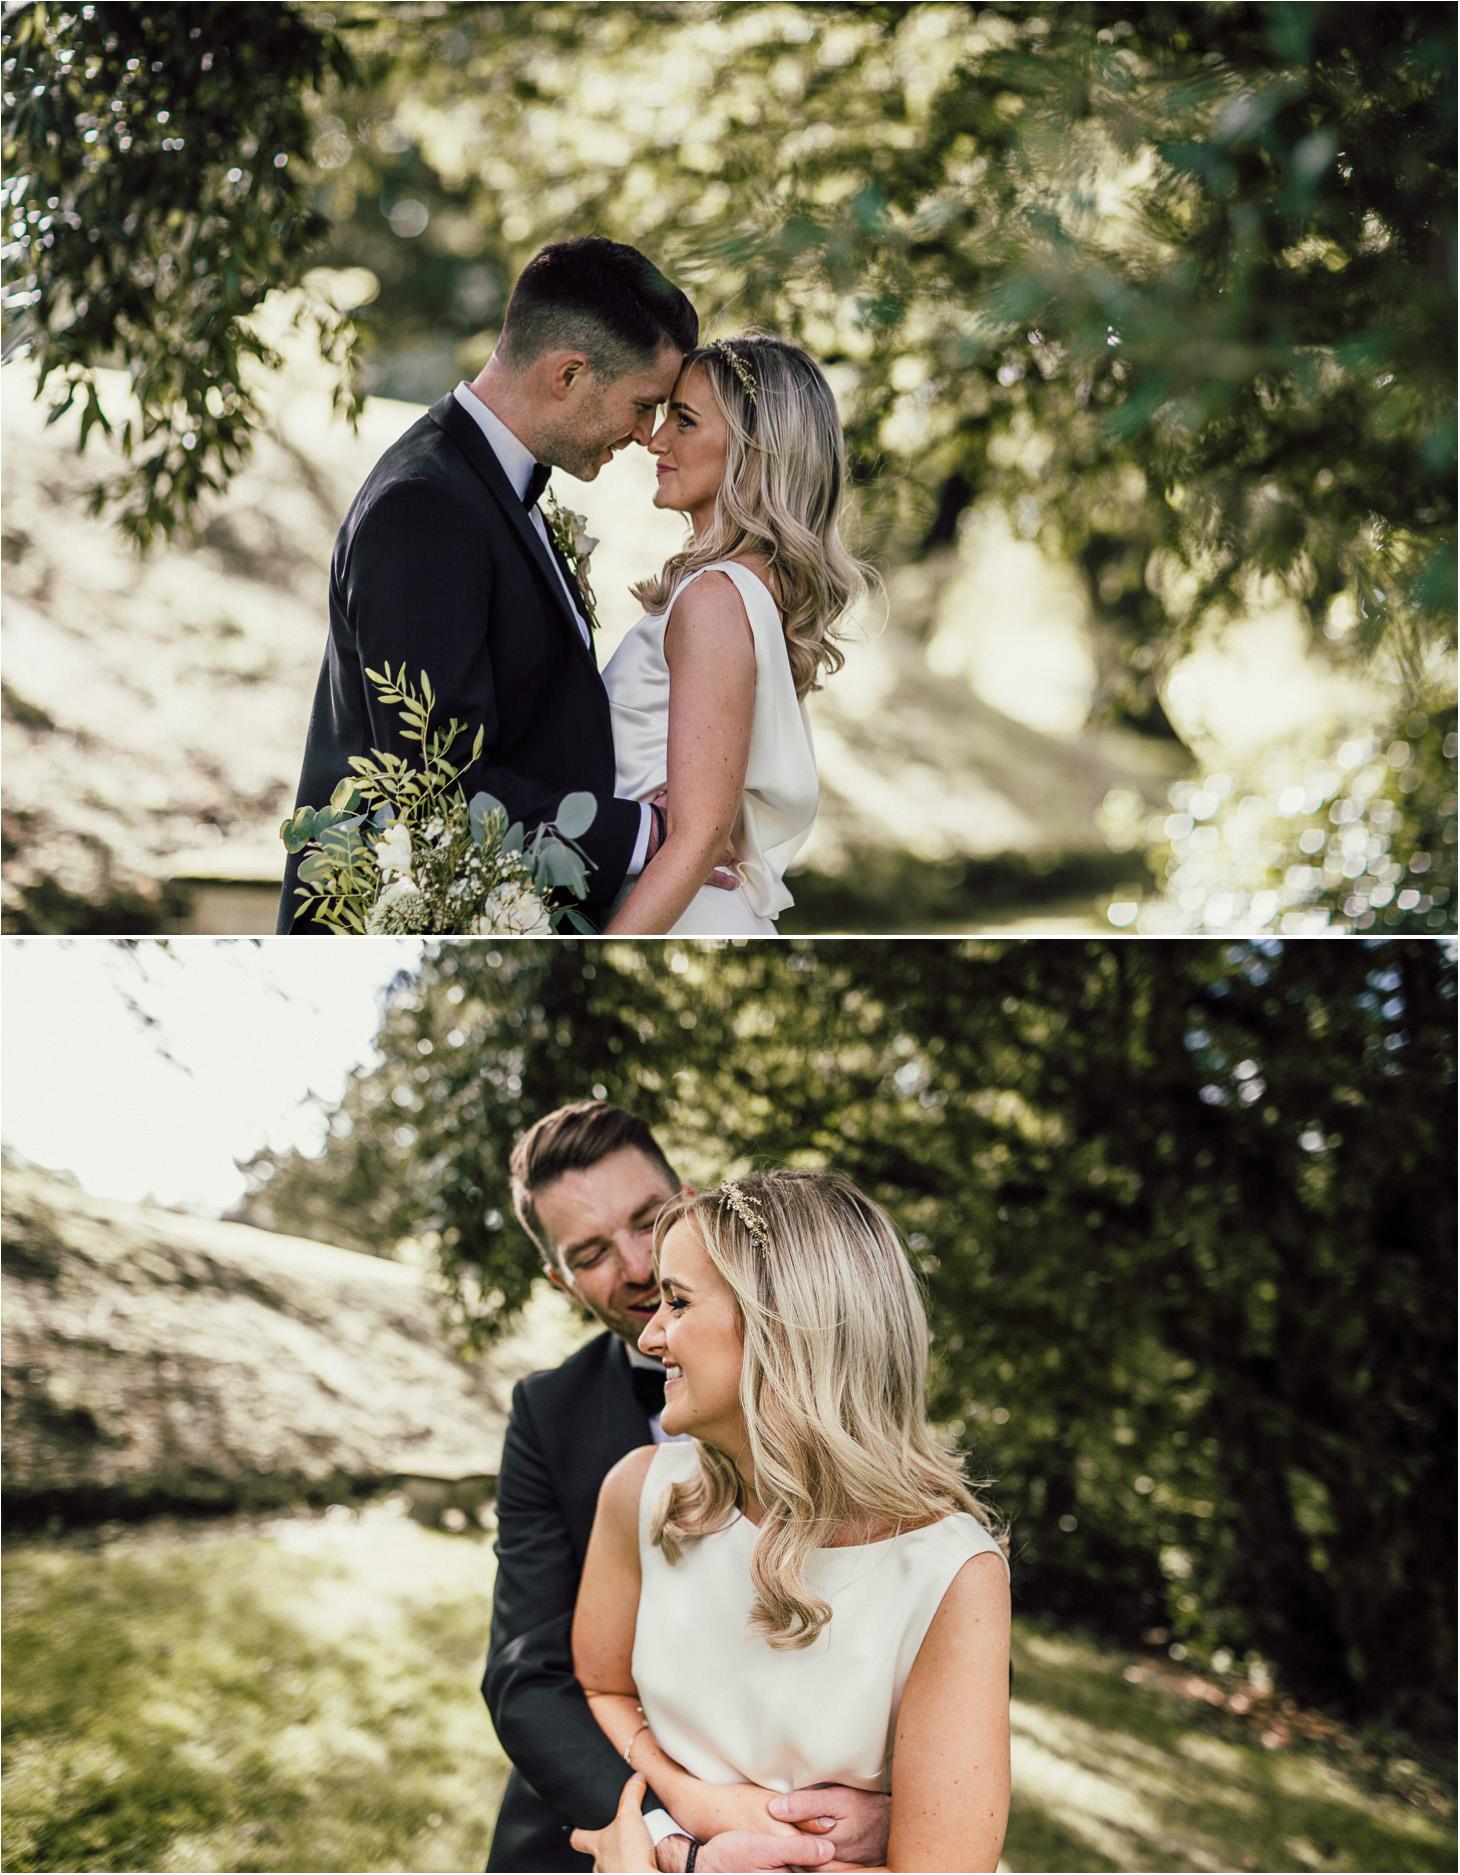 Virgina Lodge Photography. darren fitzpatrick. Wedding.18